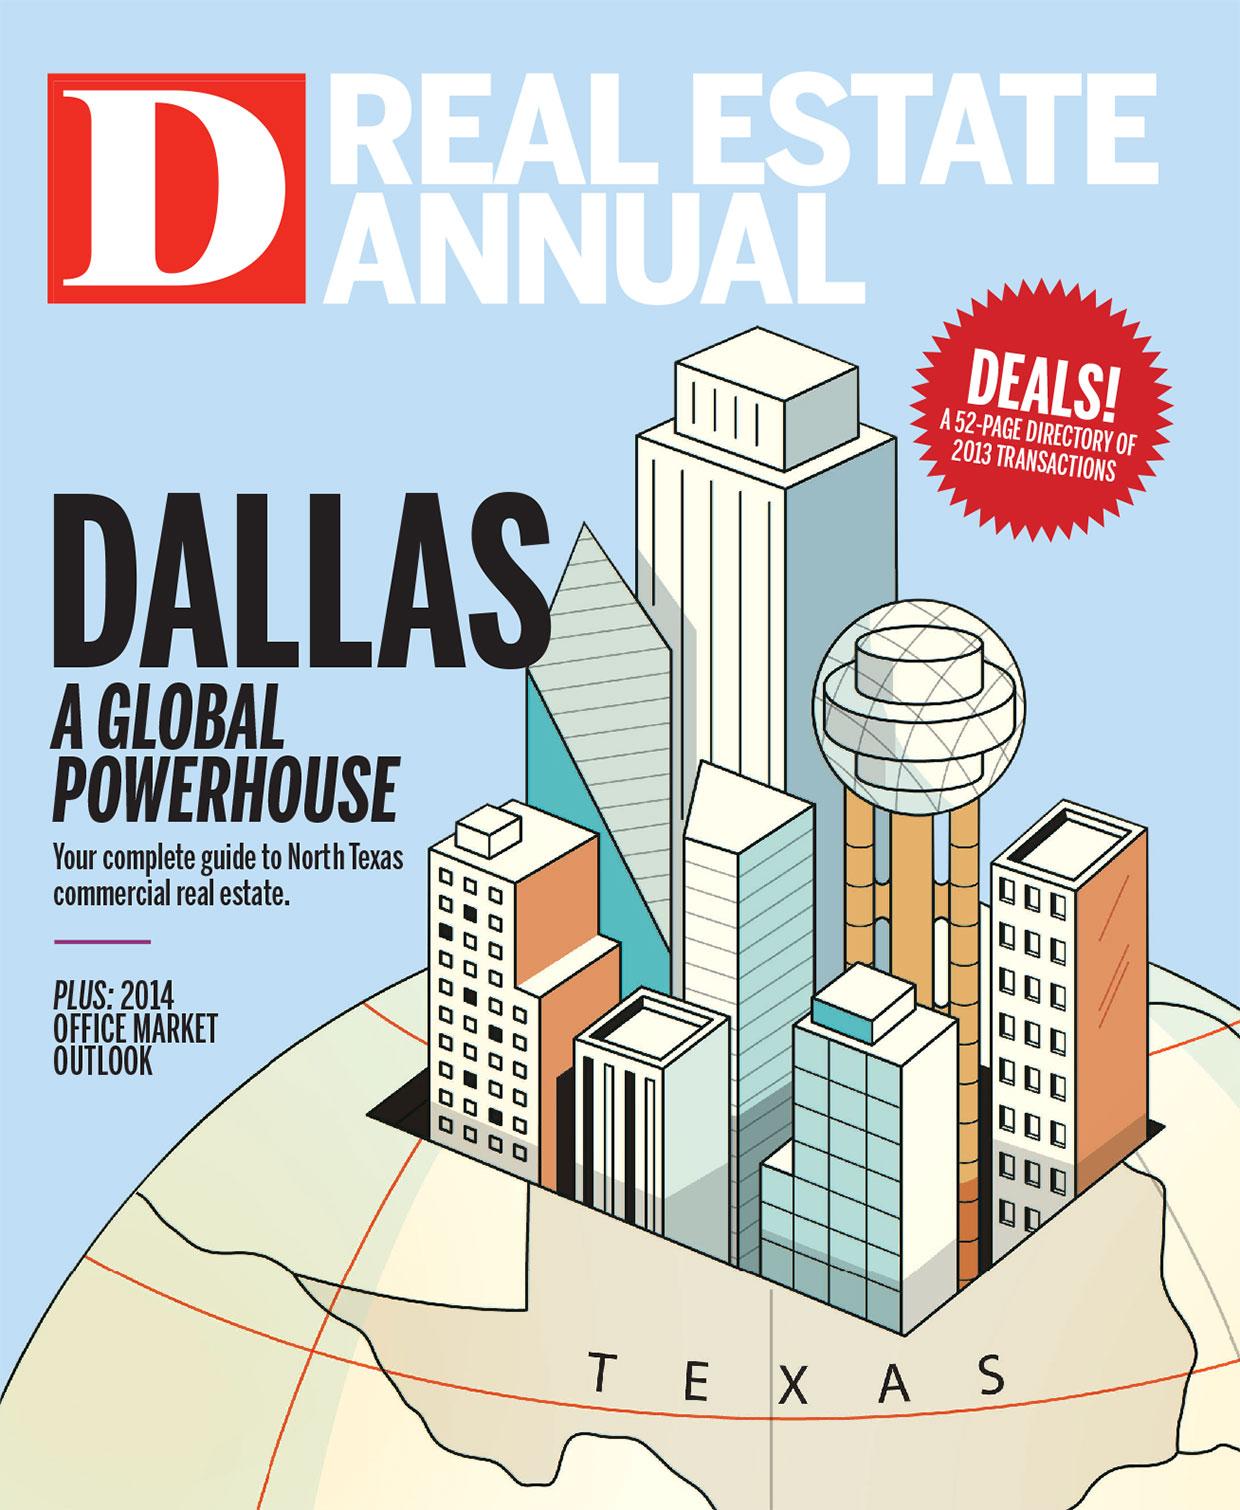 Real Estate Annual 2014 cover